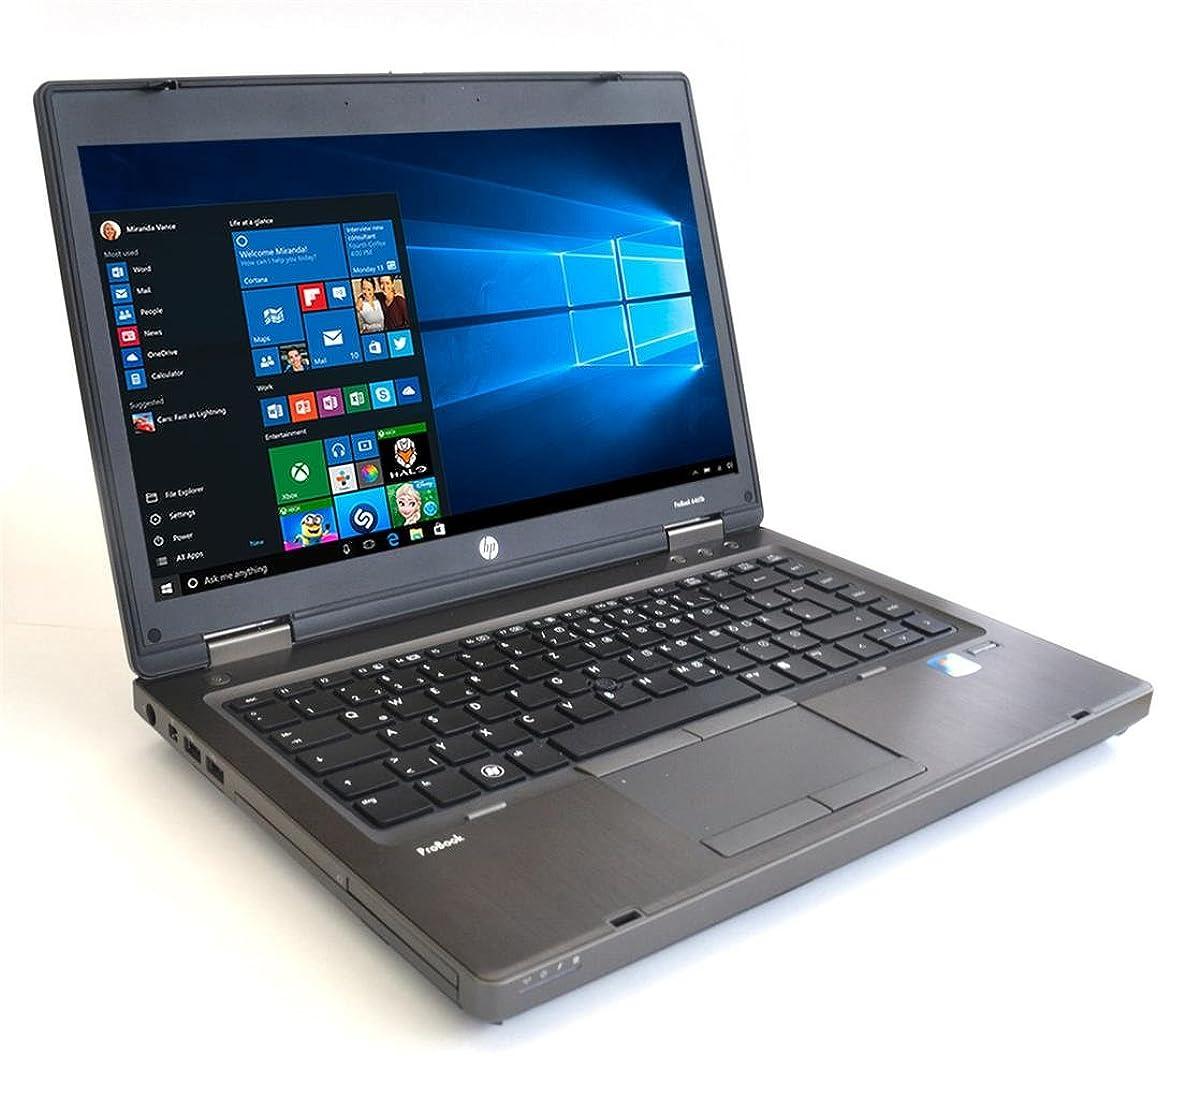 HP ProBook 6465b LAPTOP AMD A4 3310MX 2.1GHz - 4GB DDR3 - 250GB SATA - DVDRW - Windows 10 Home 64bit - (Renewed)